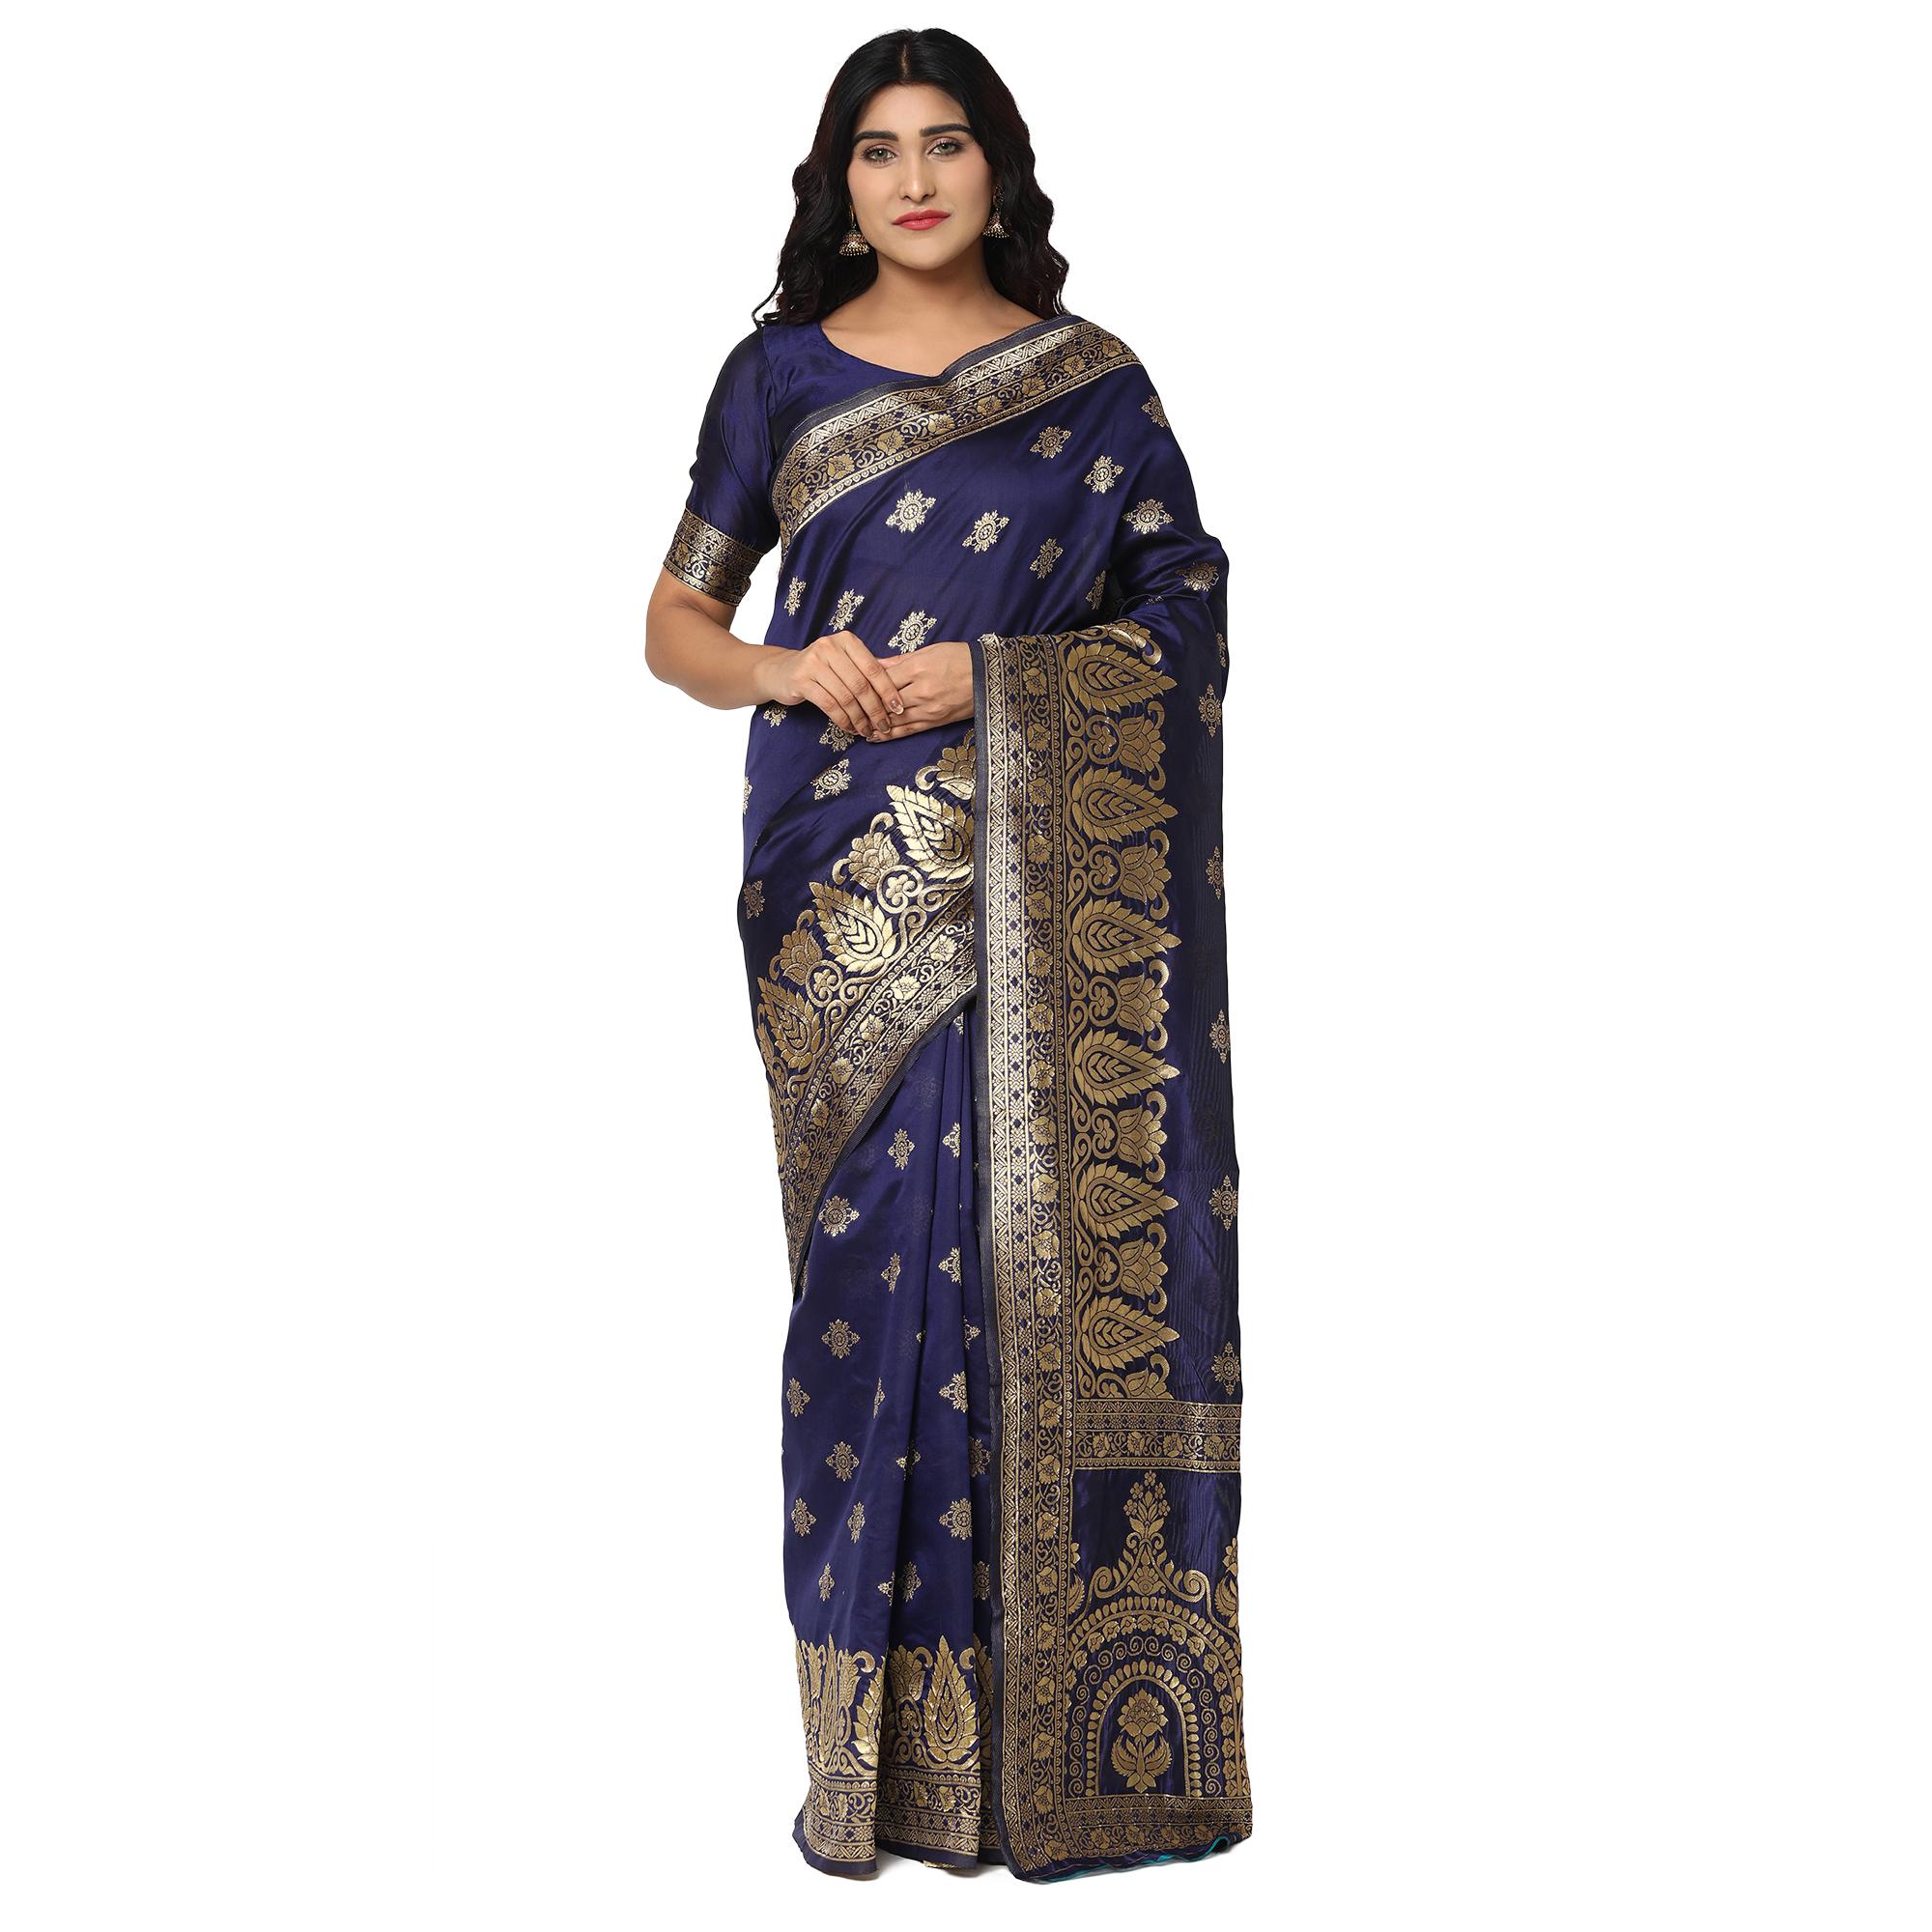 Glemora Nevy Blue Beautiful Ethnic Wear Silk Blend Banarasi Traditional Saree